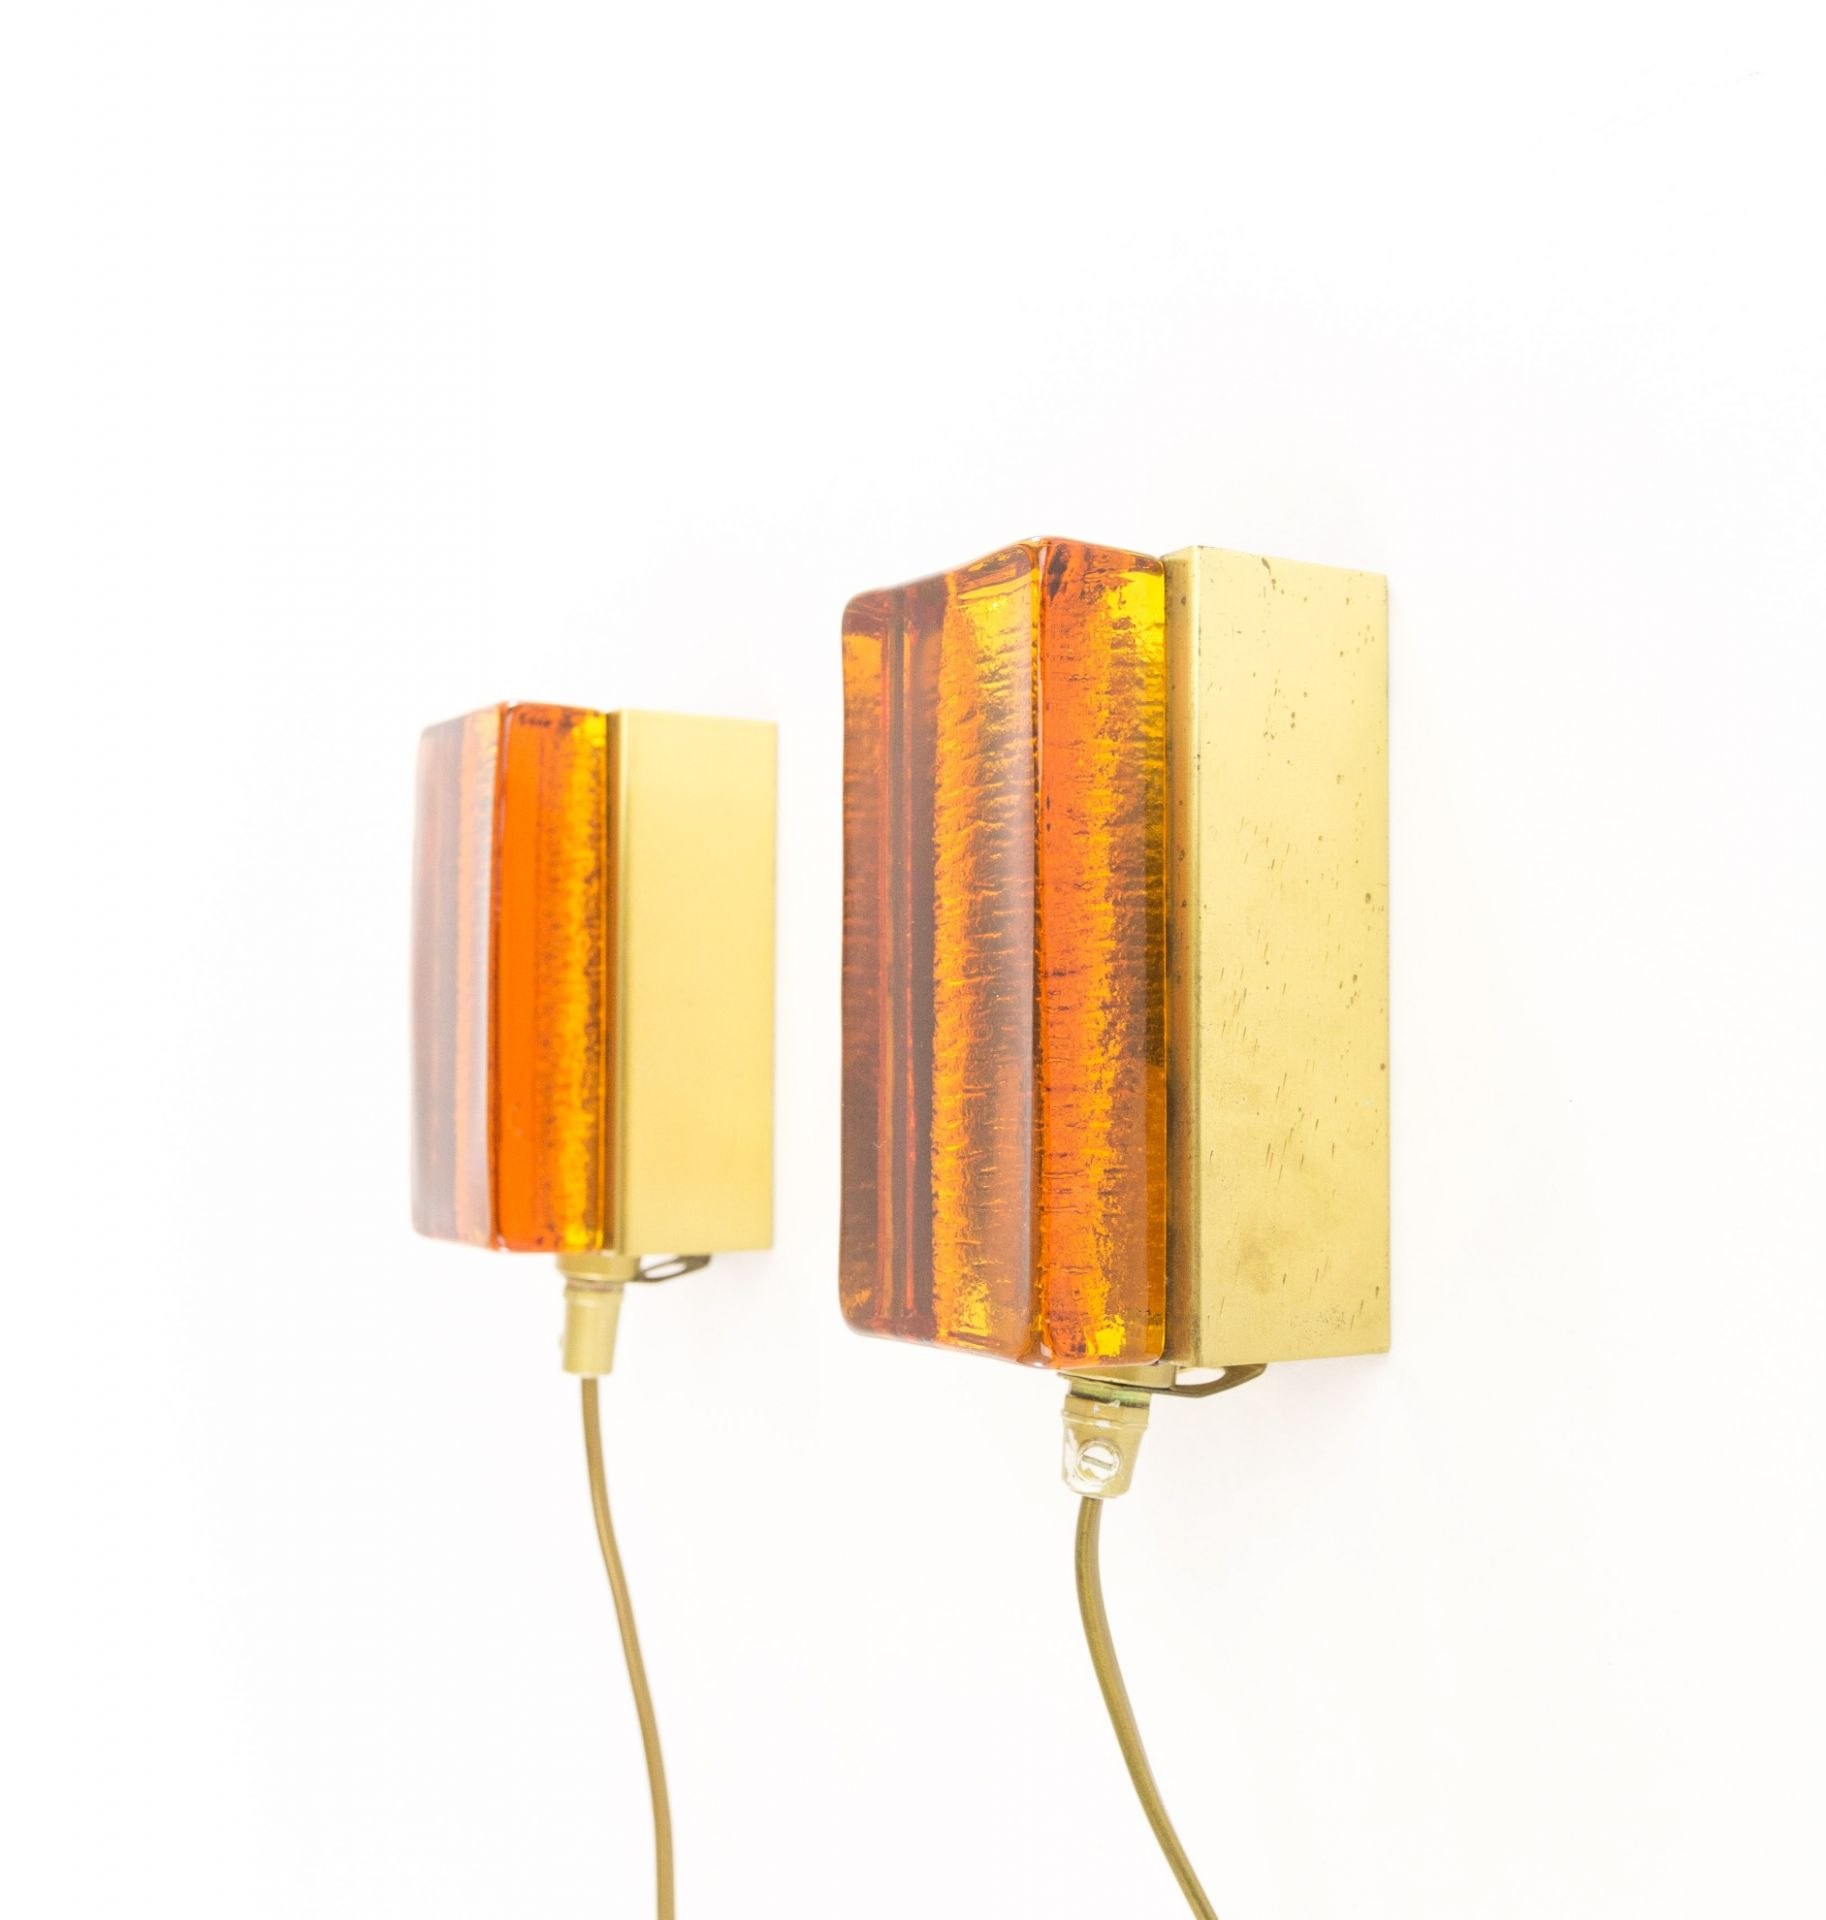 Pair of Amber Atlantic Wall lamps by Vitrika, 1970s